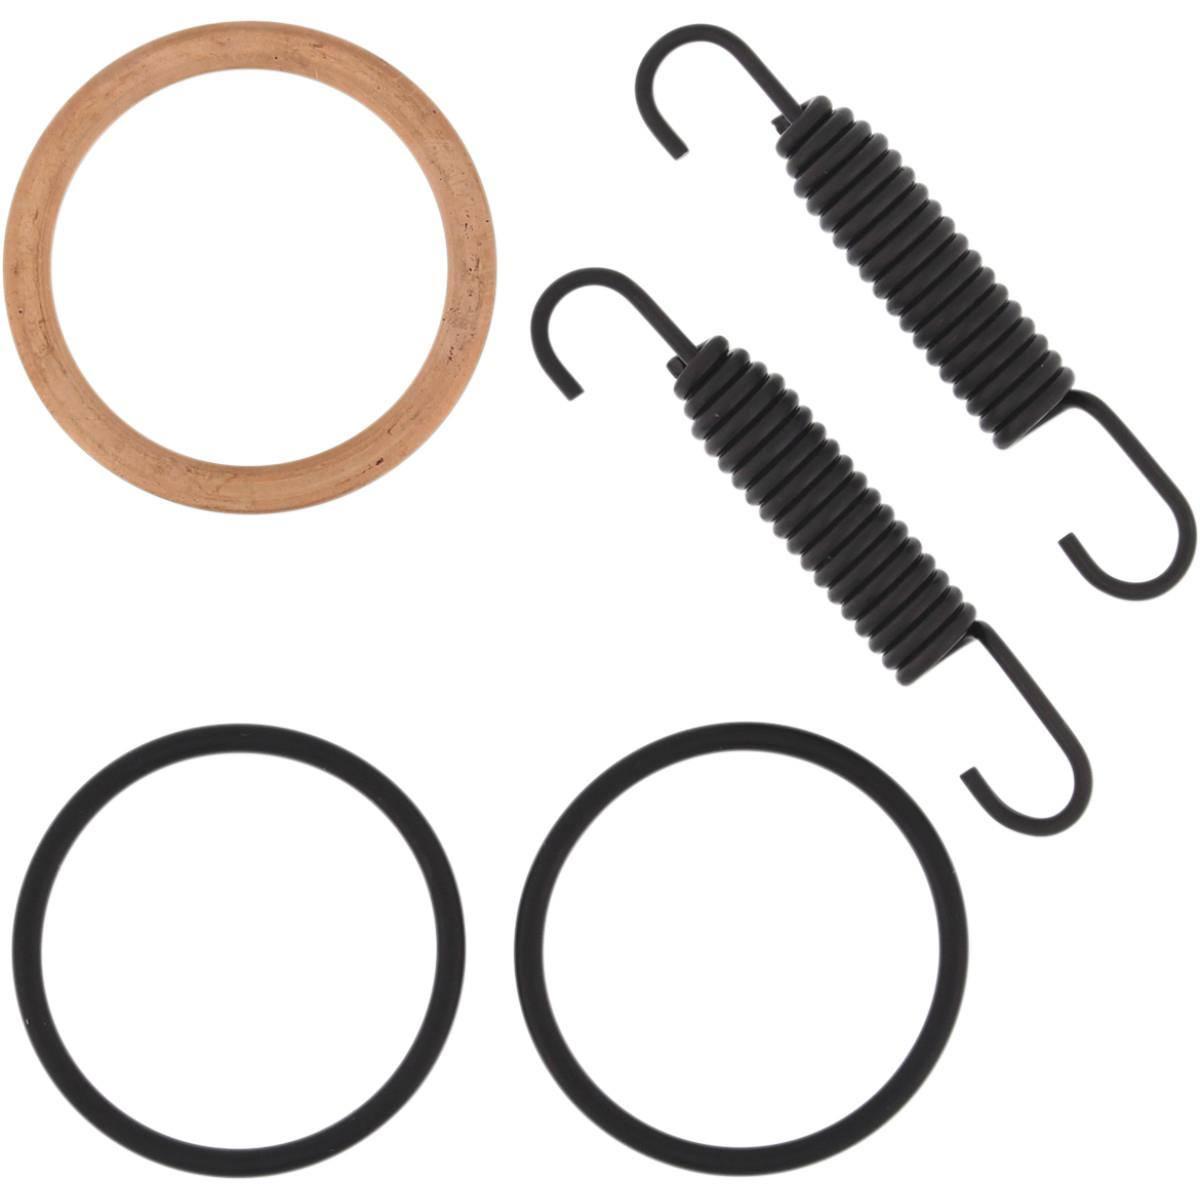 Moose Racing Exhaust Gasket Kit 0934-5493